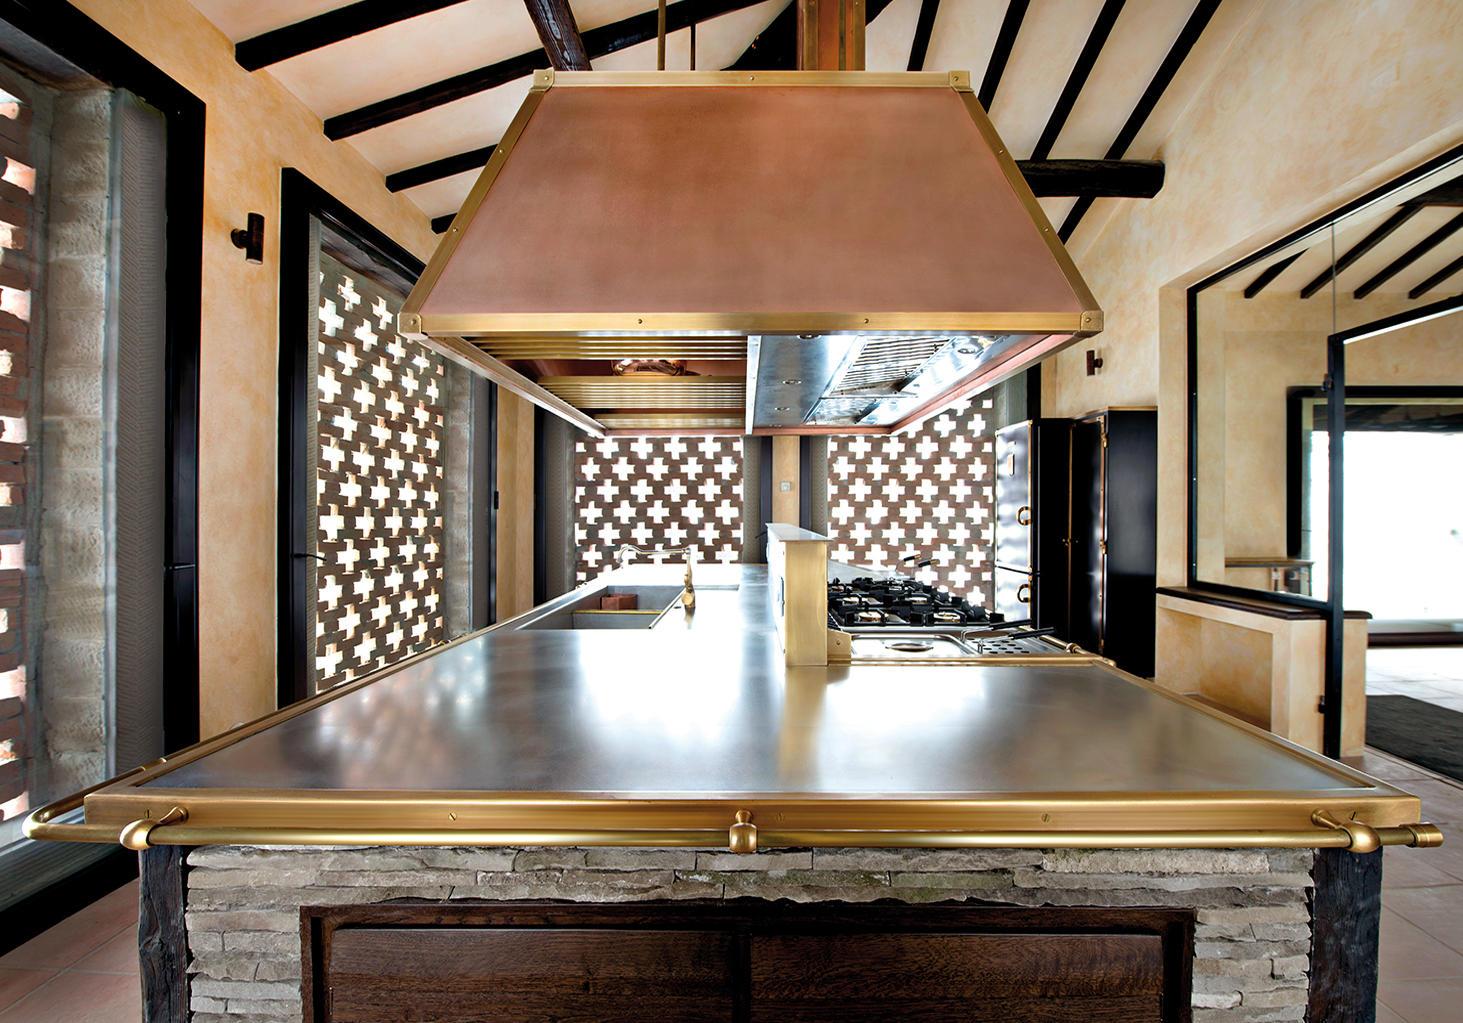 DAVANZATI PALACE CUCINE - Cucine a parete Officine Gullo | Architonic